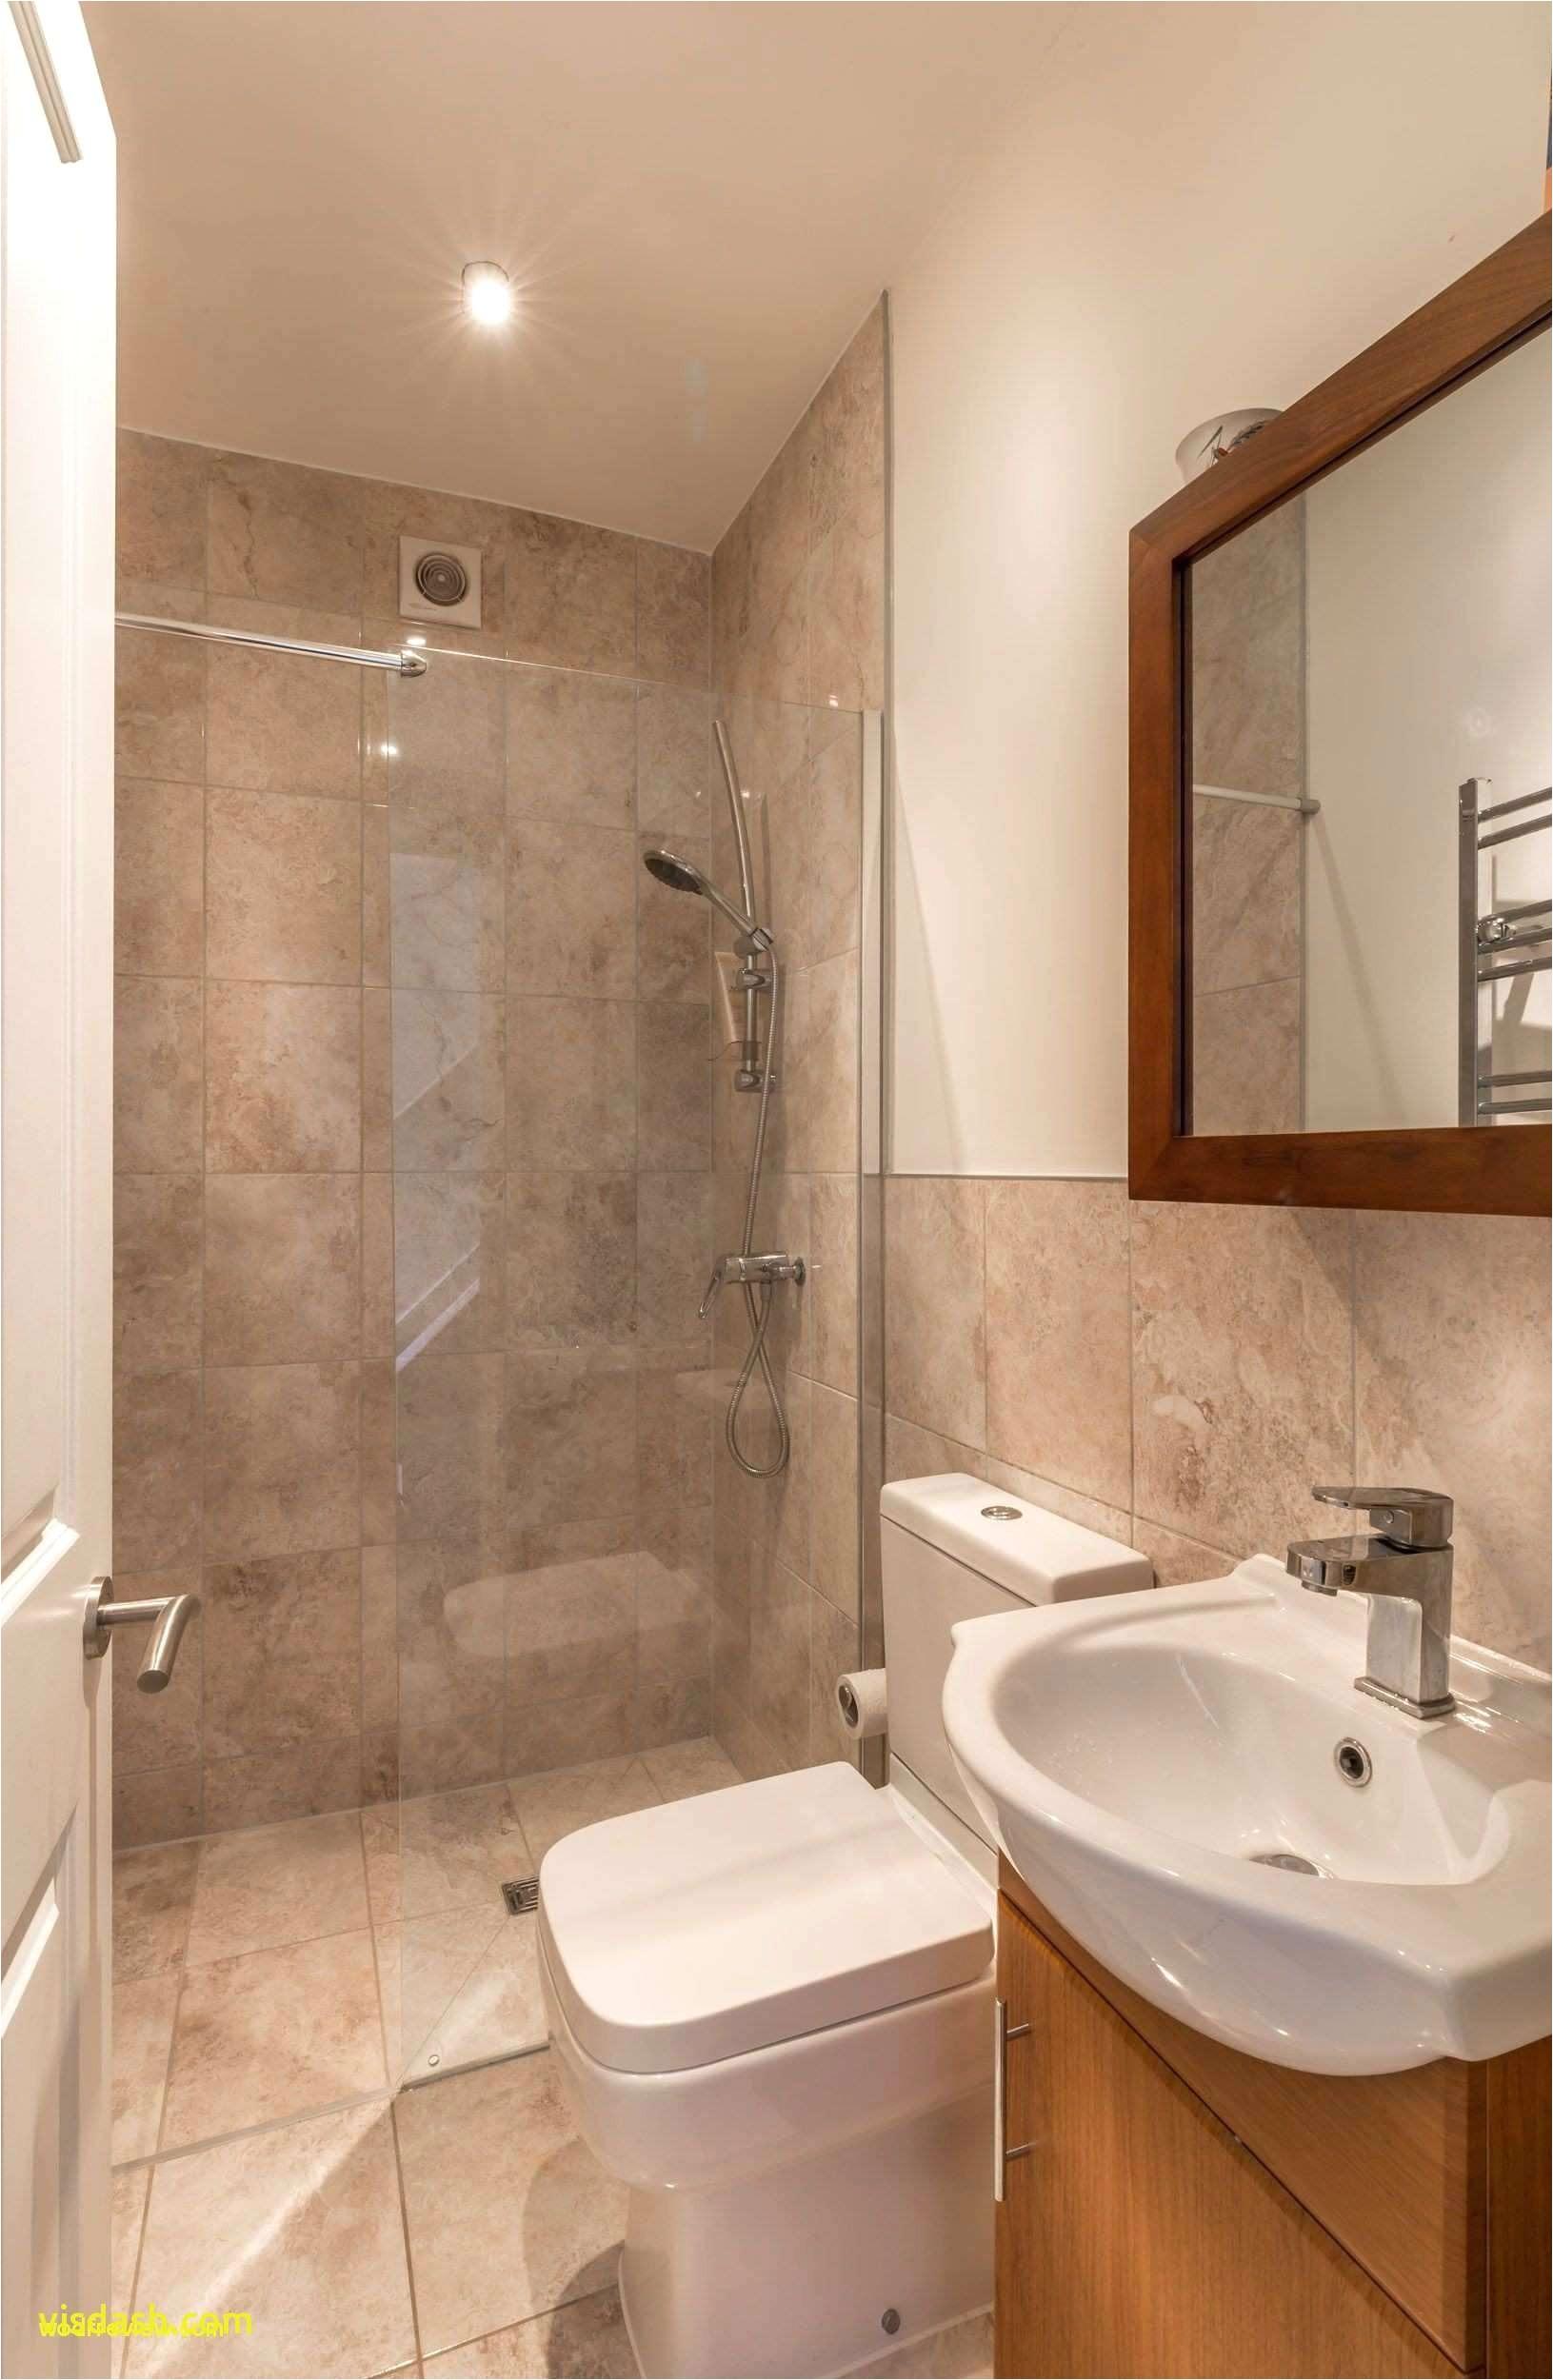 Amazing Bathroom Design New Luxury Shower Light H Sink Install I 0d Scheme Mirror Lighting